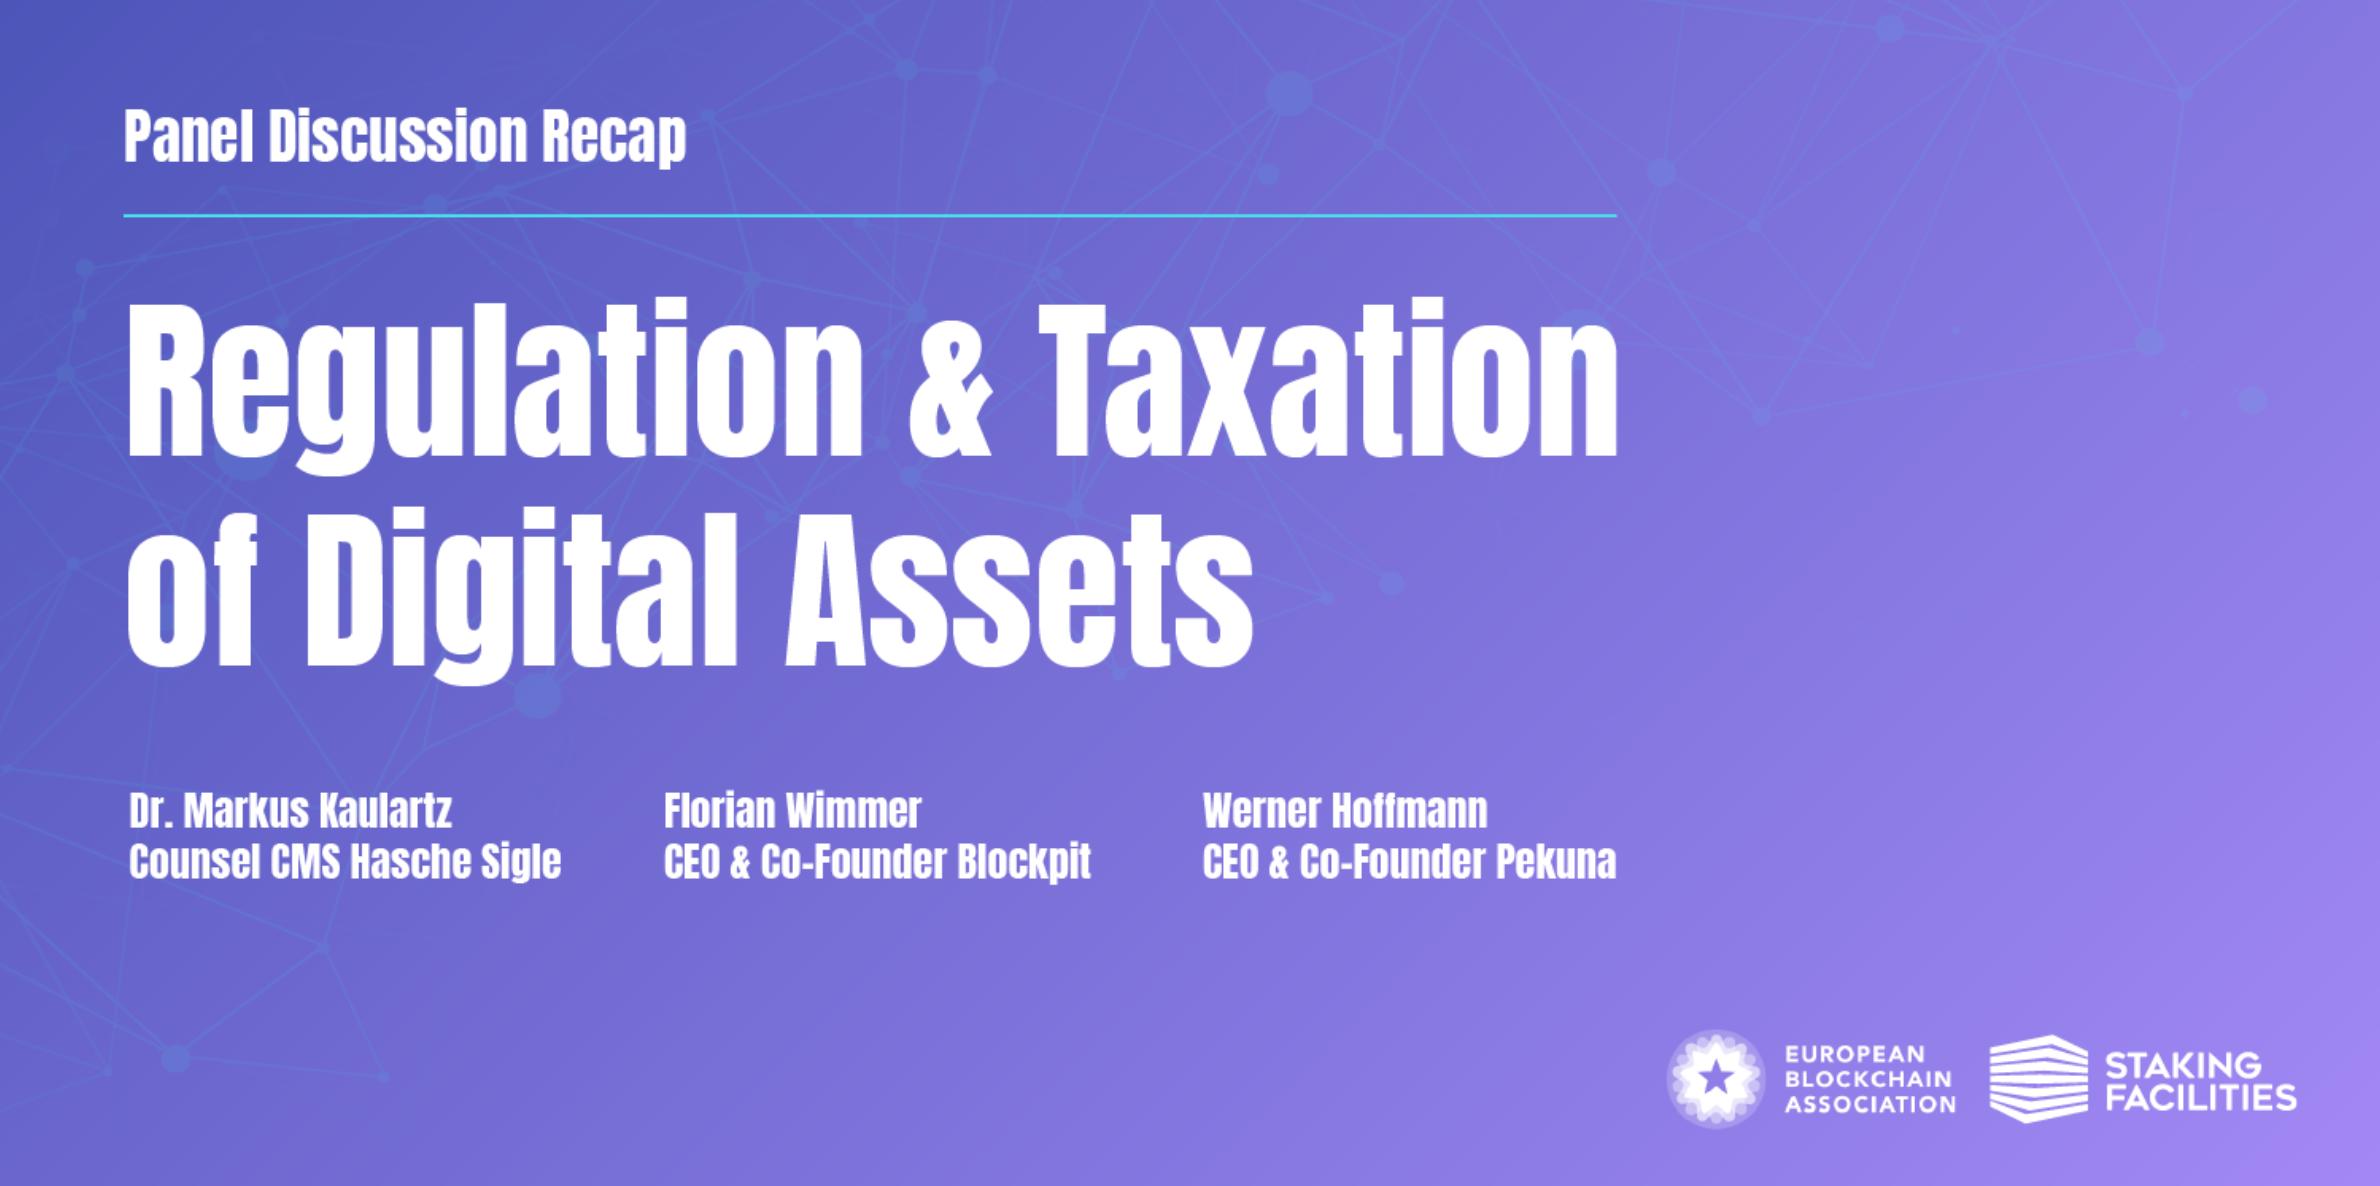 Panel discussion: Regulation & Taxation of Digital Assets — Recap